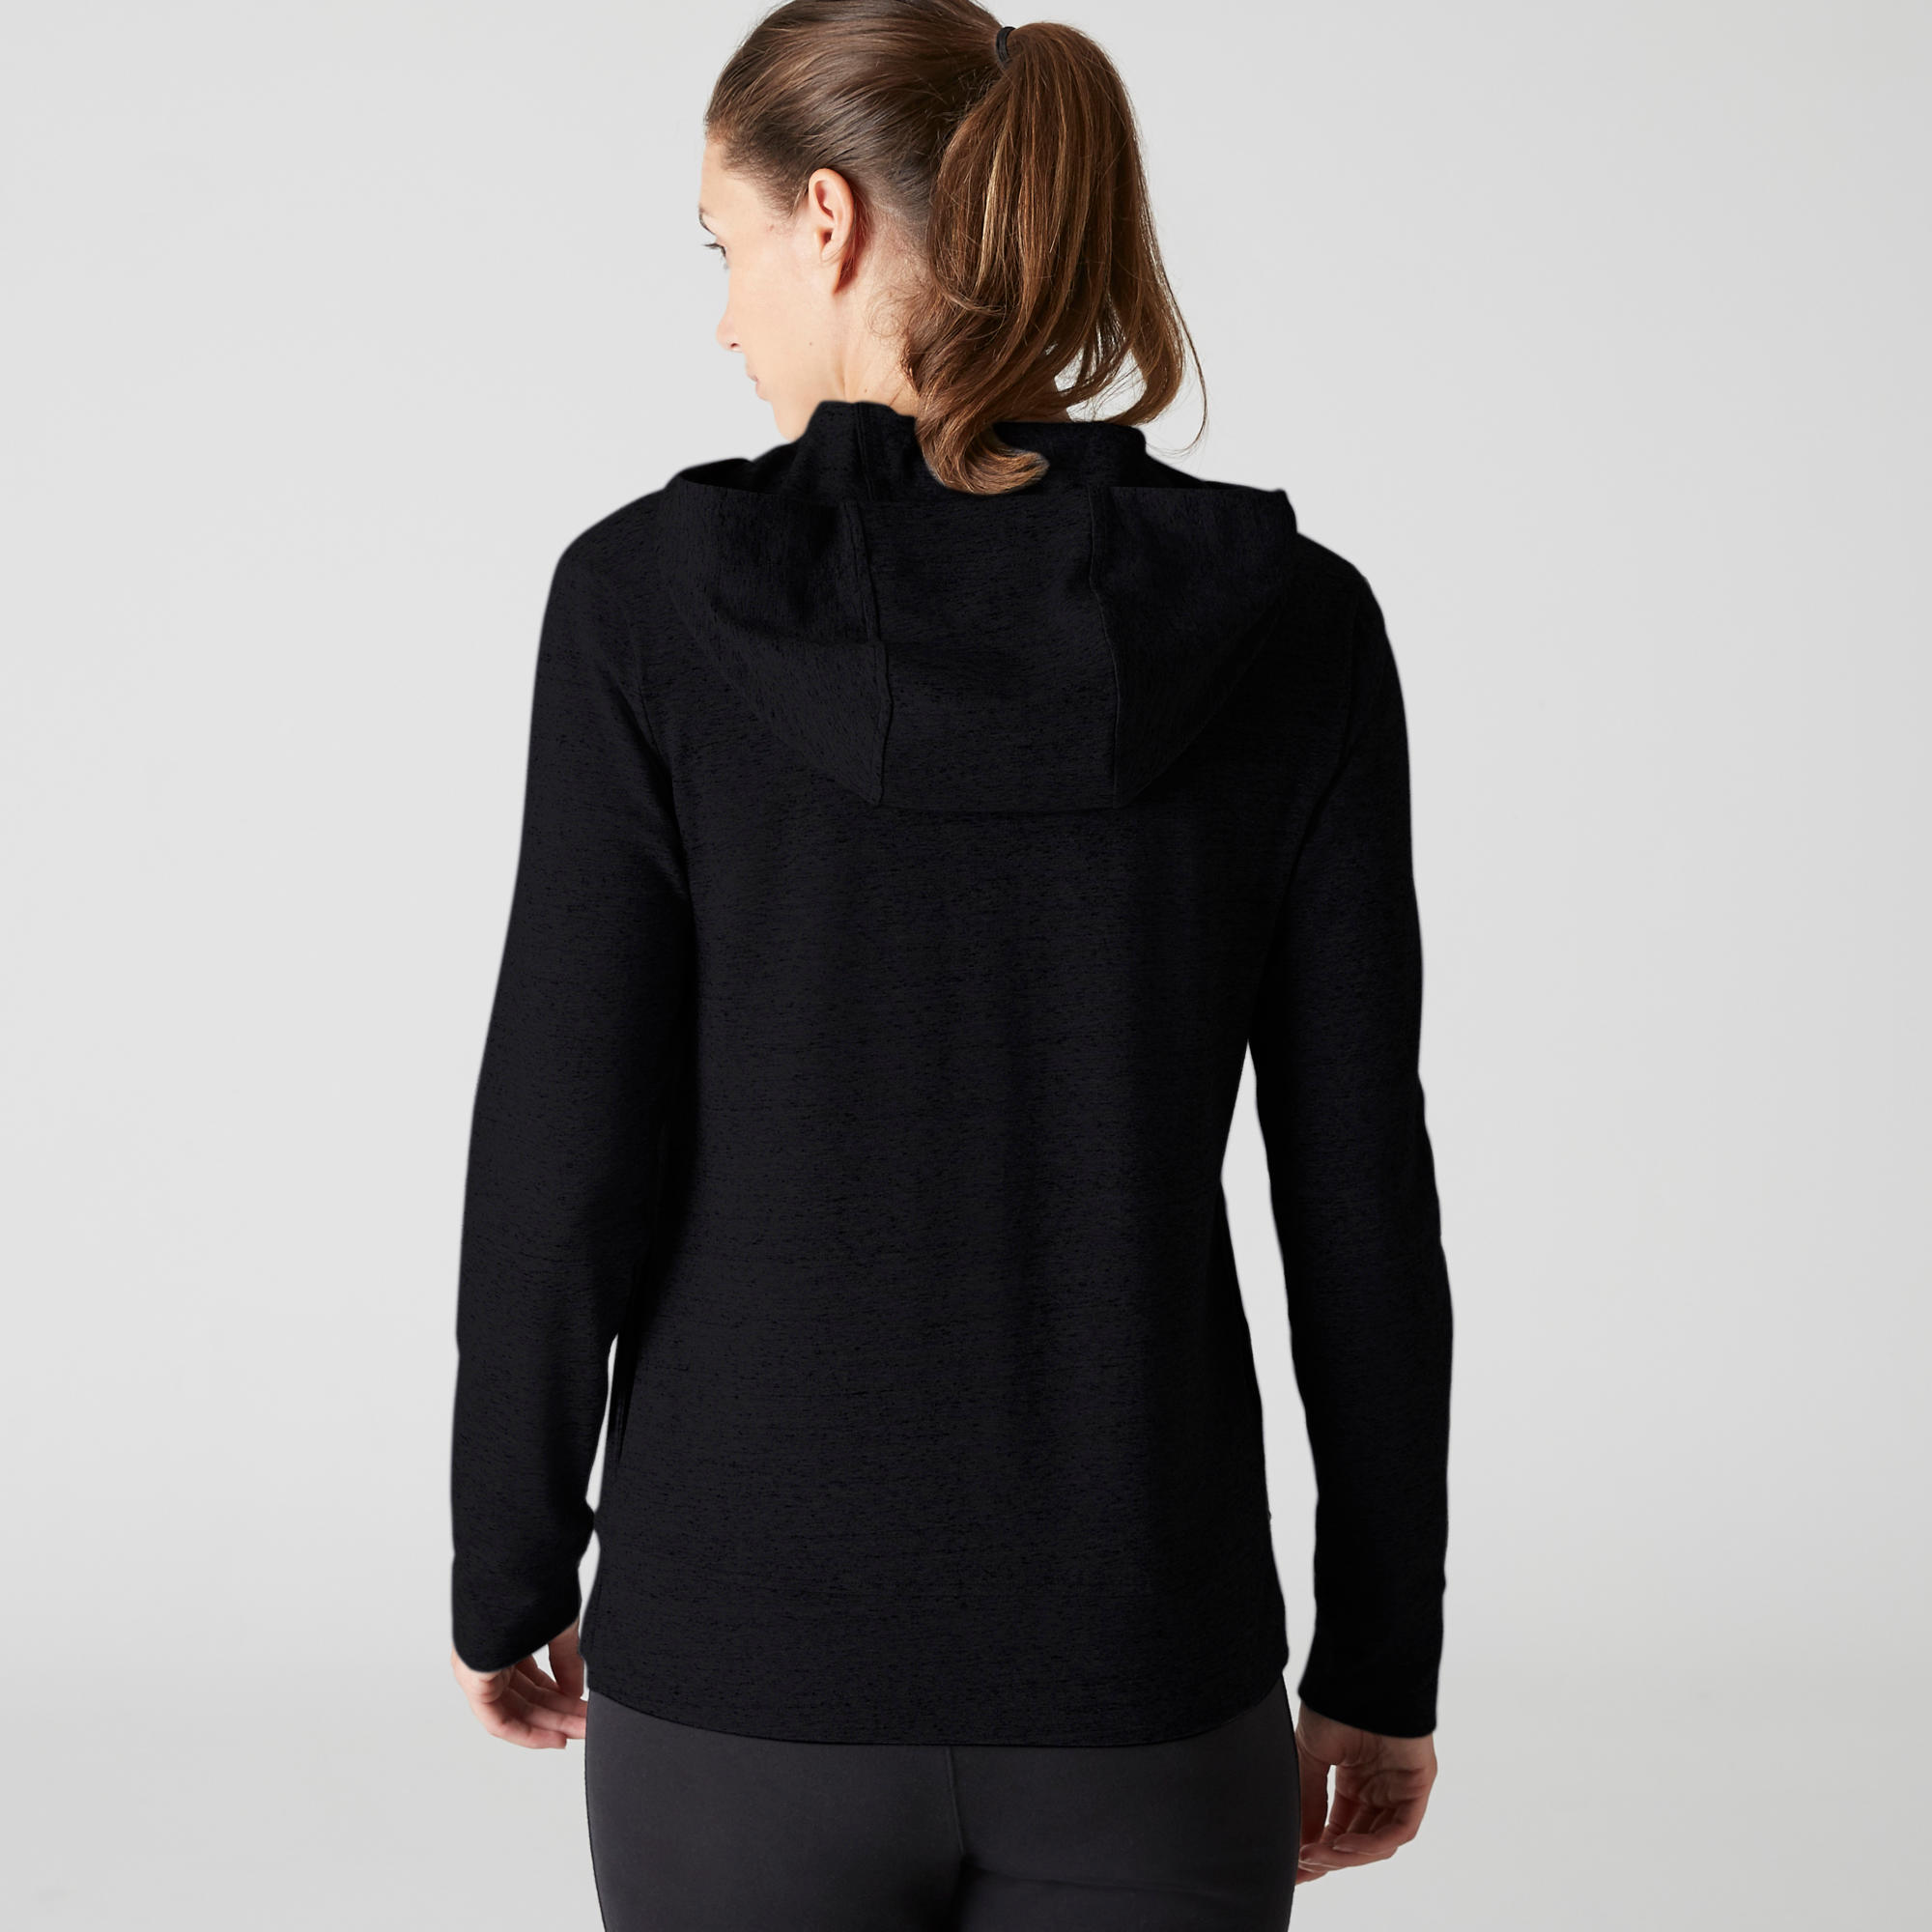 100 Chaqueta Sudadera Negro capucha Mujer Pilates Gym Soft con KlFJ1c